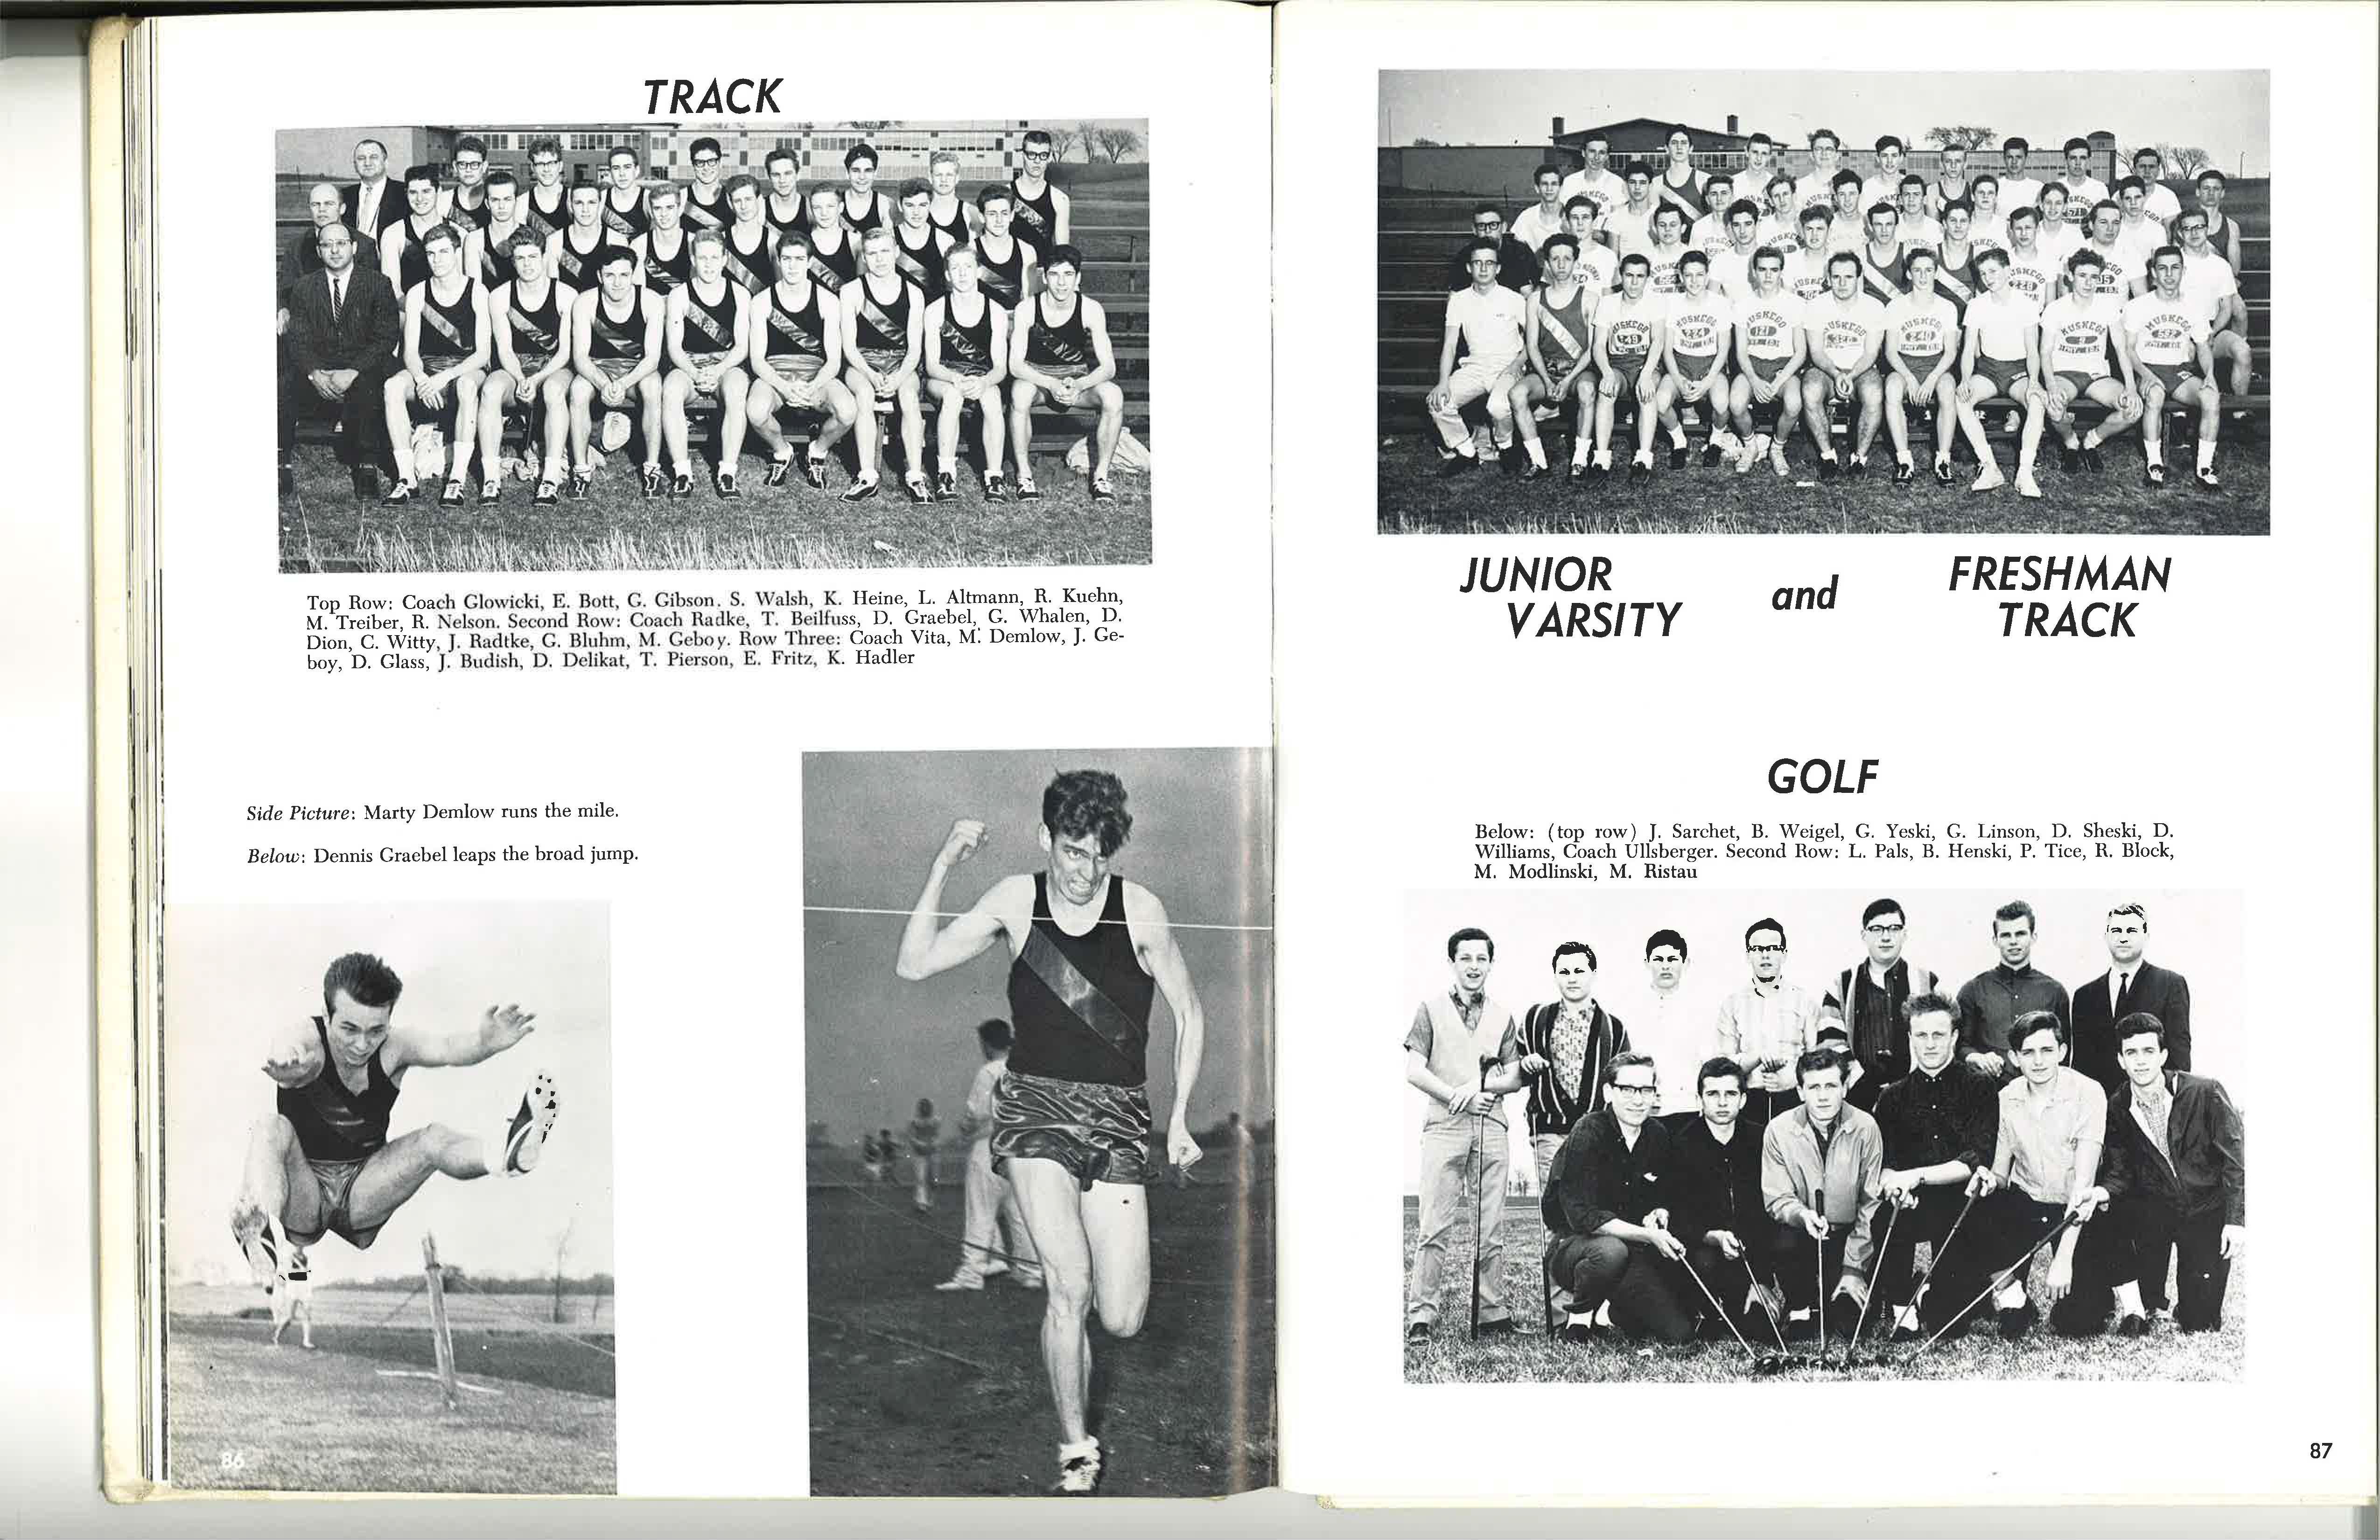 1964_Yearbook_Athletics_86-87.jpg